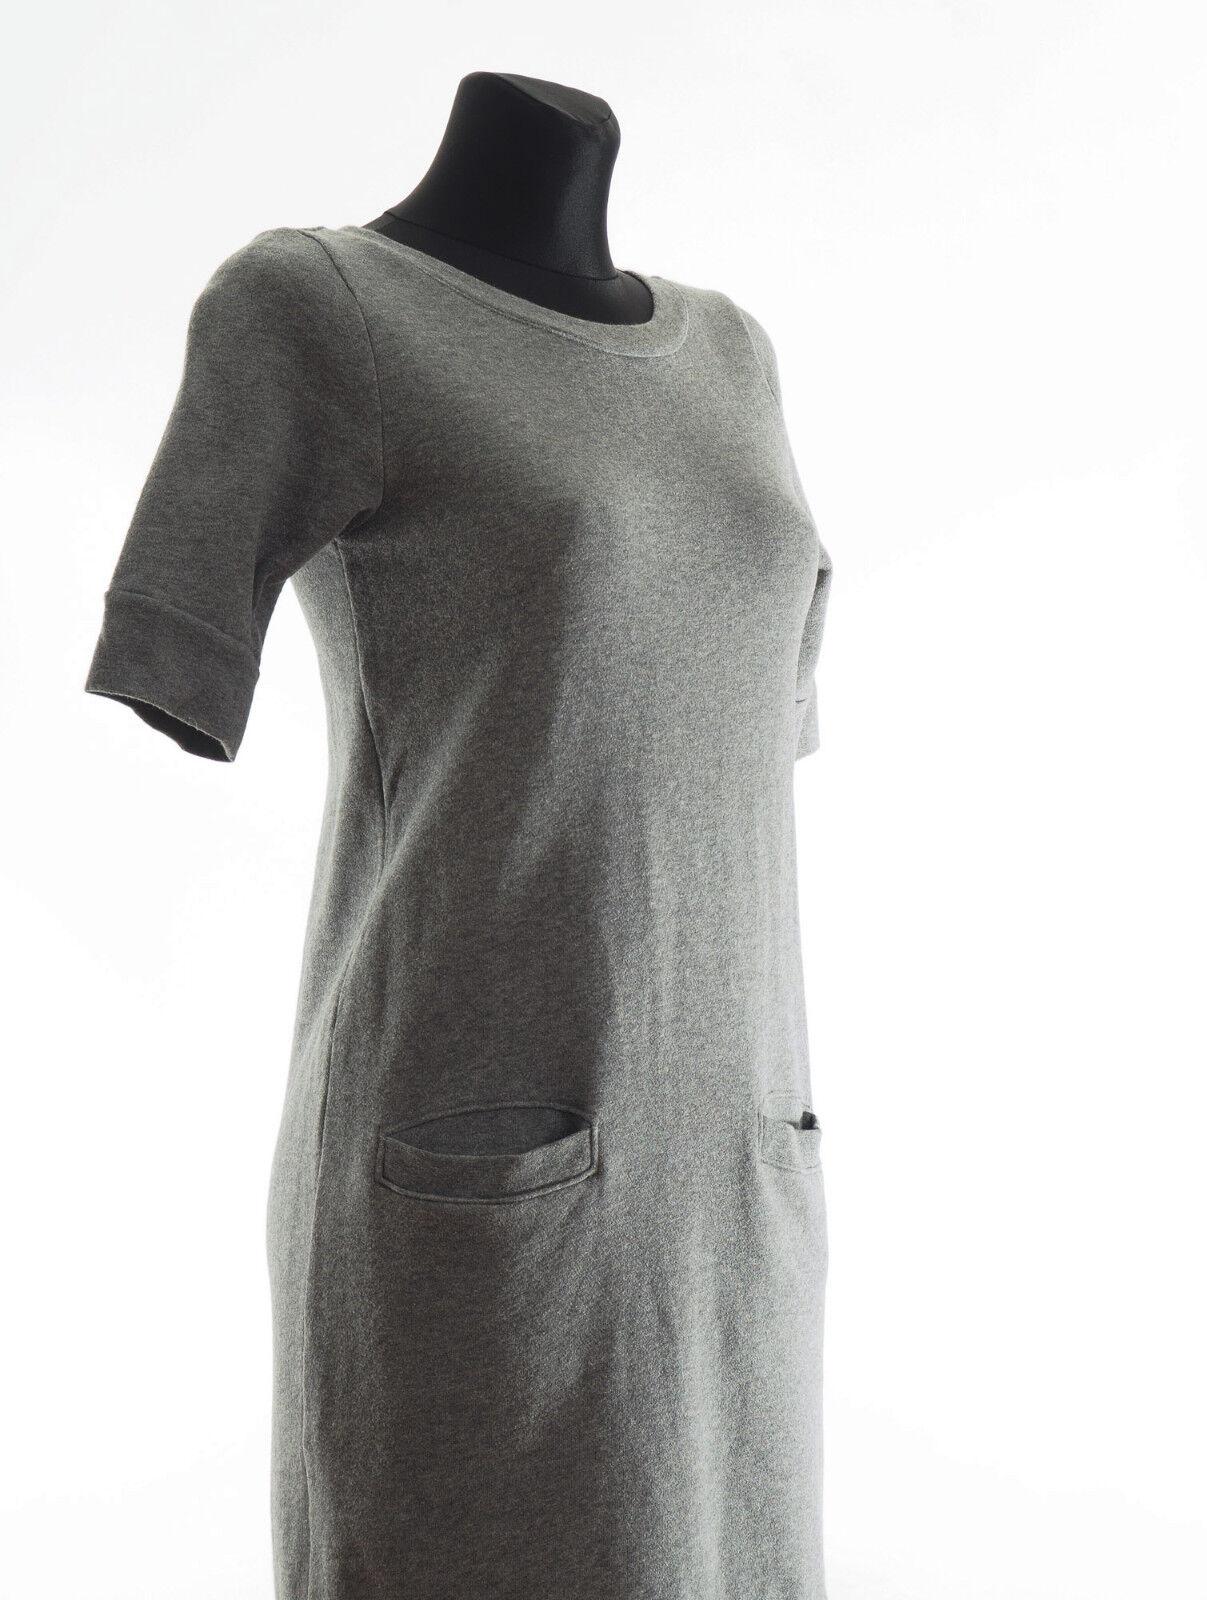 Club Monaco Monaco Monaco Women's Grey short sleeved Sweat Dress Size 0 e88e1c